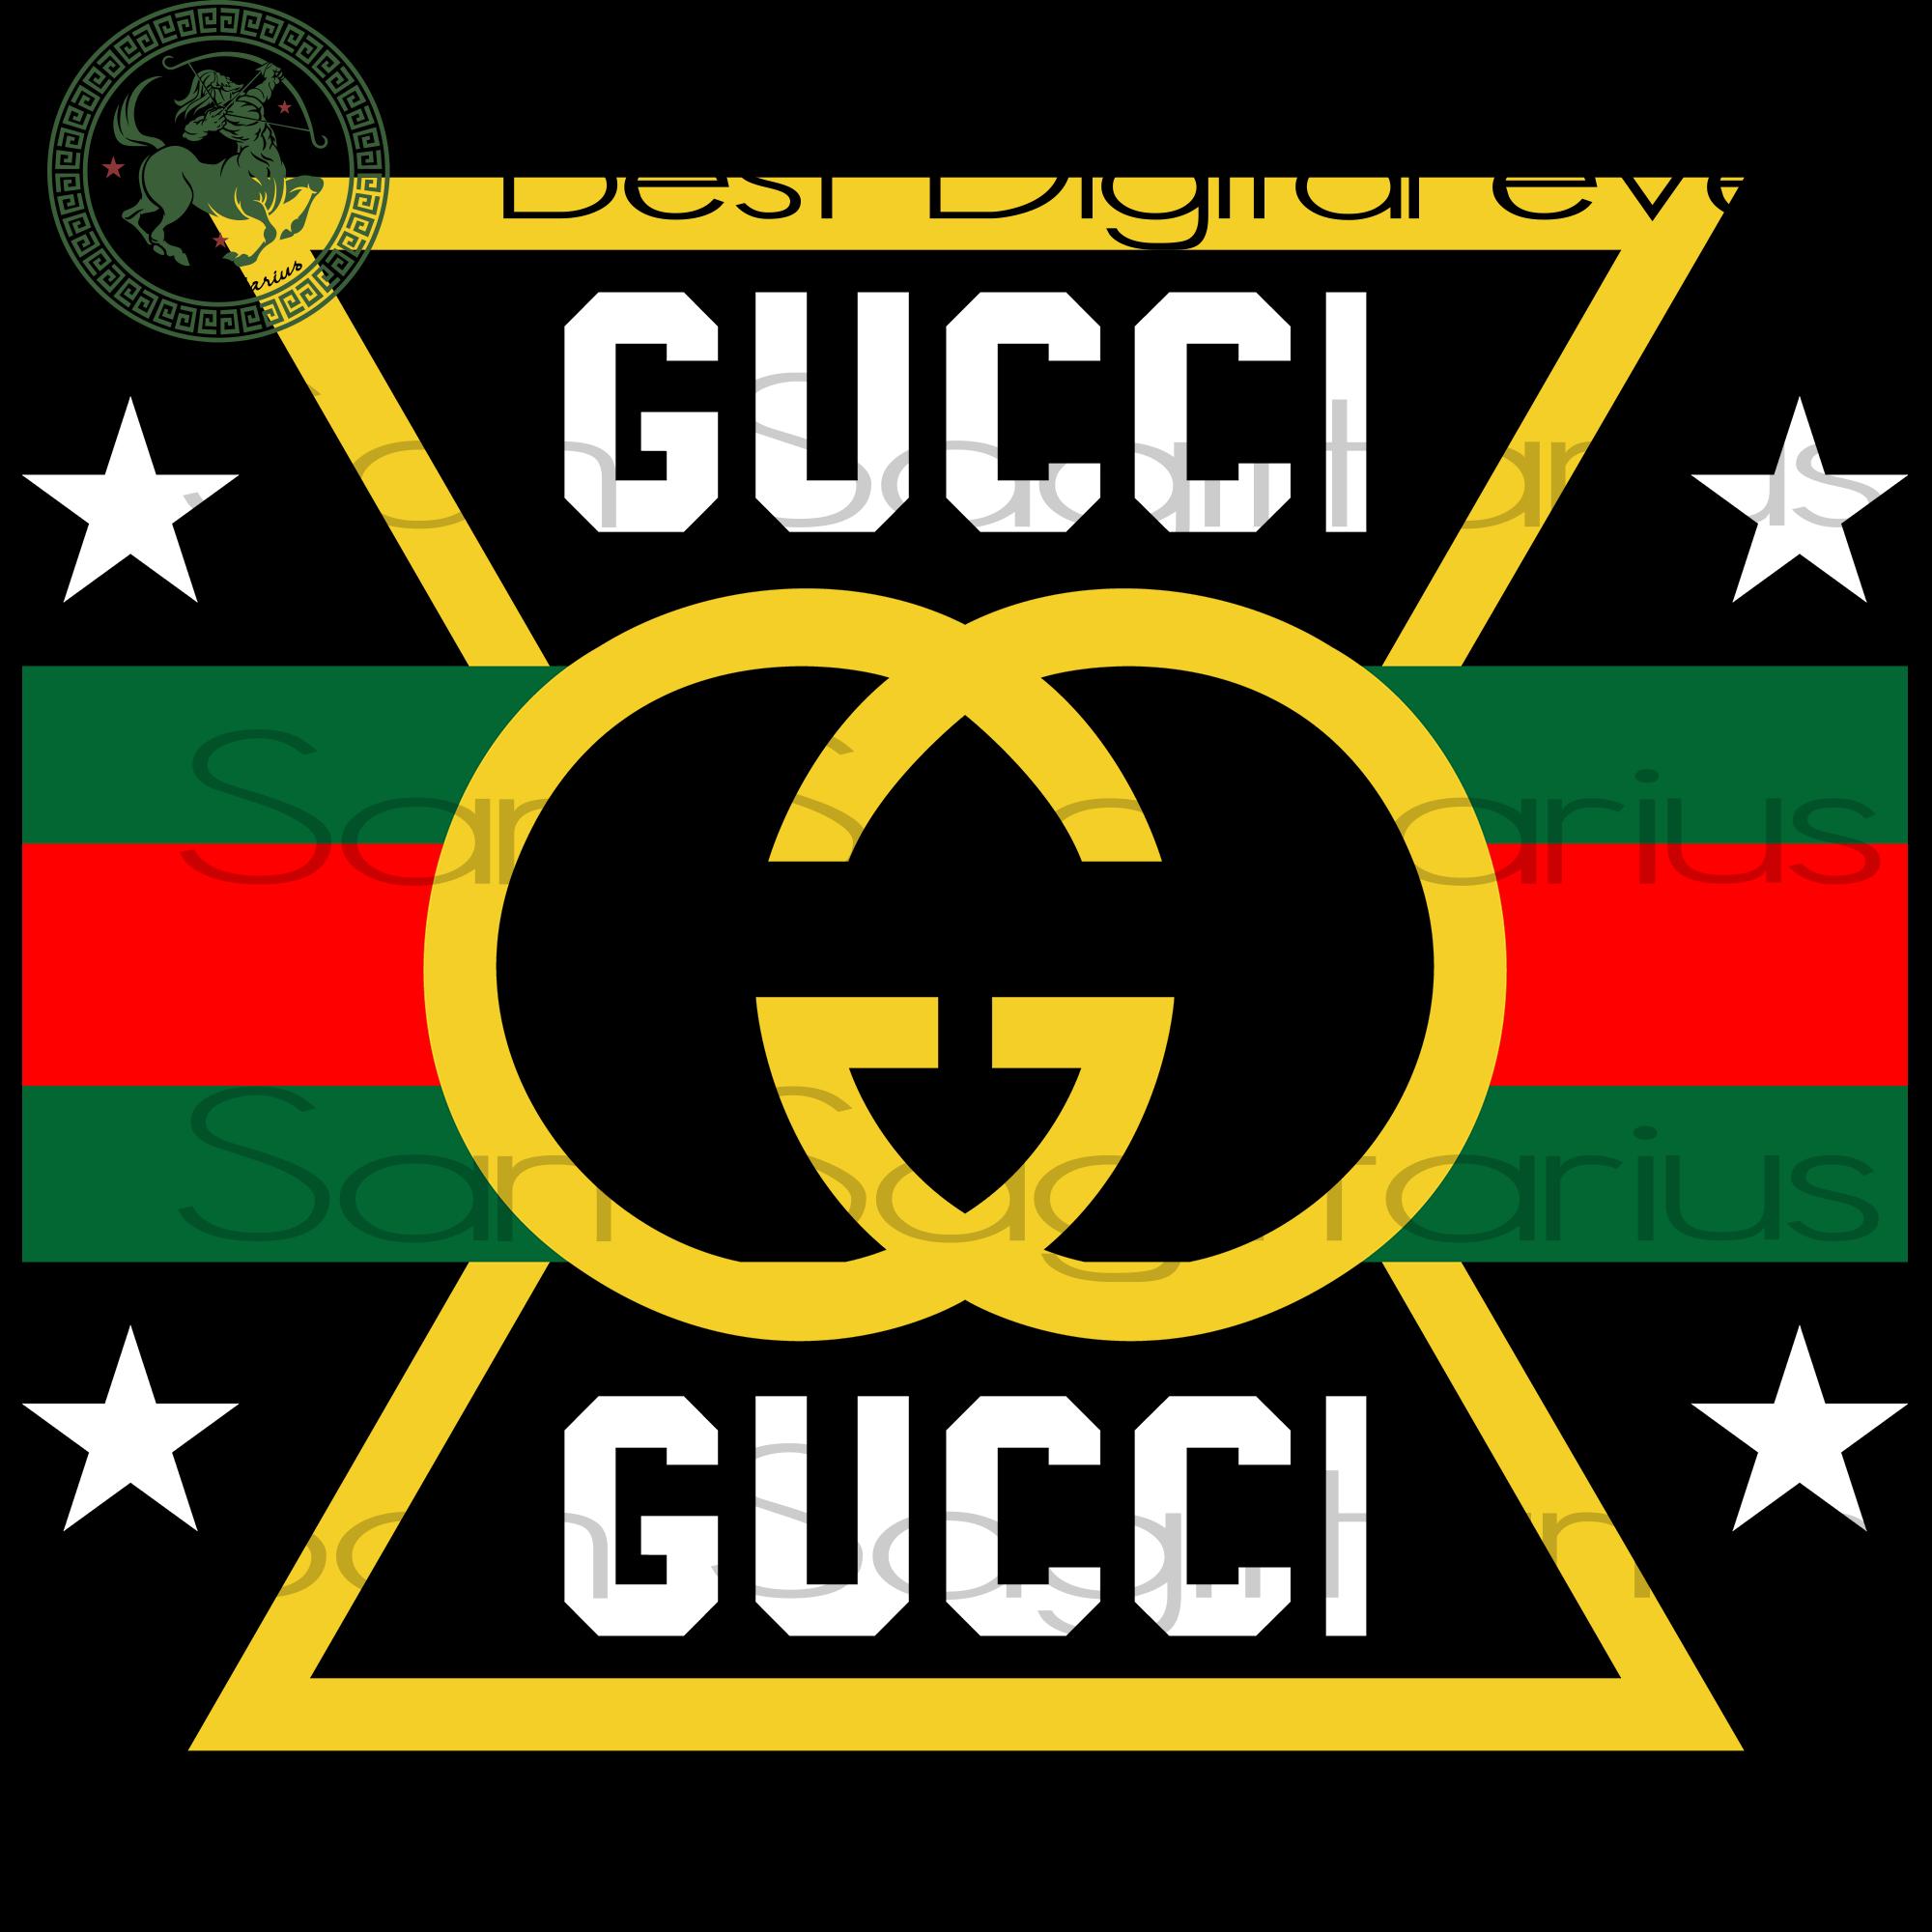 Logo Brand Svg Custom Logo Svg Logo Customized Branding Logo Fashion Trends Brand Trending Now Logo Brand Vector Fashion Logo Png Logo Personalized In 2020 Logo Branding Gucci Vintage Gucci